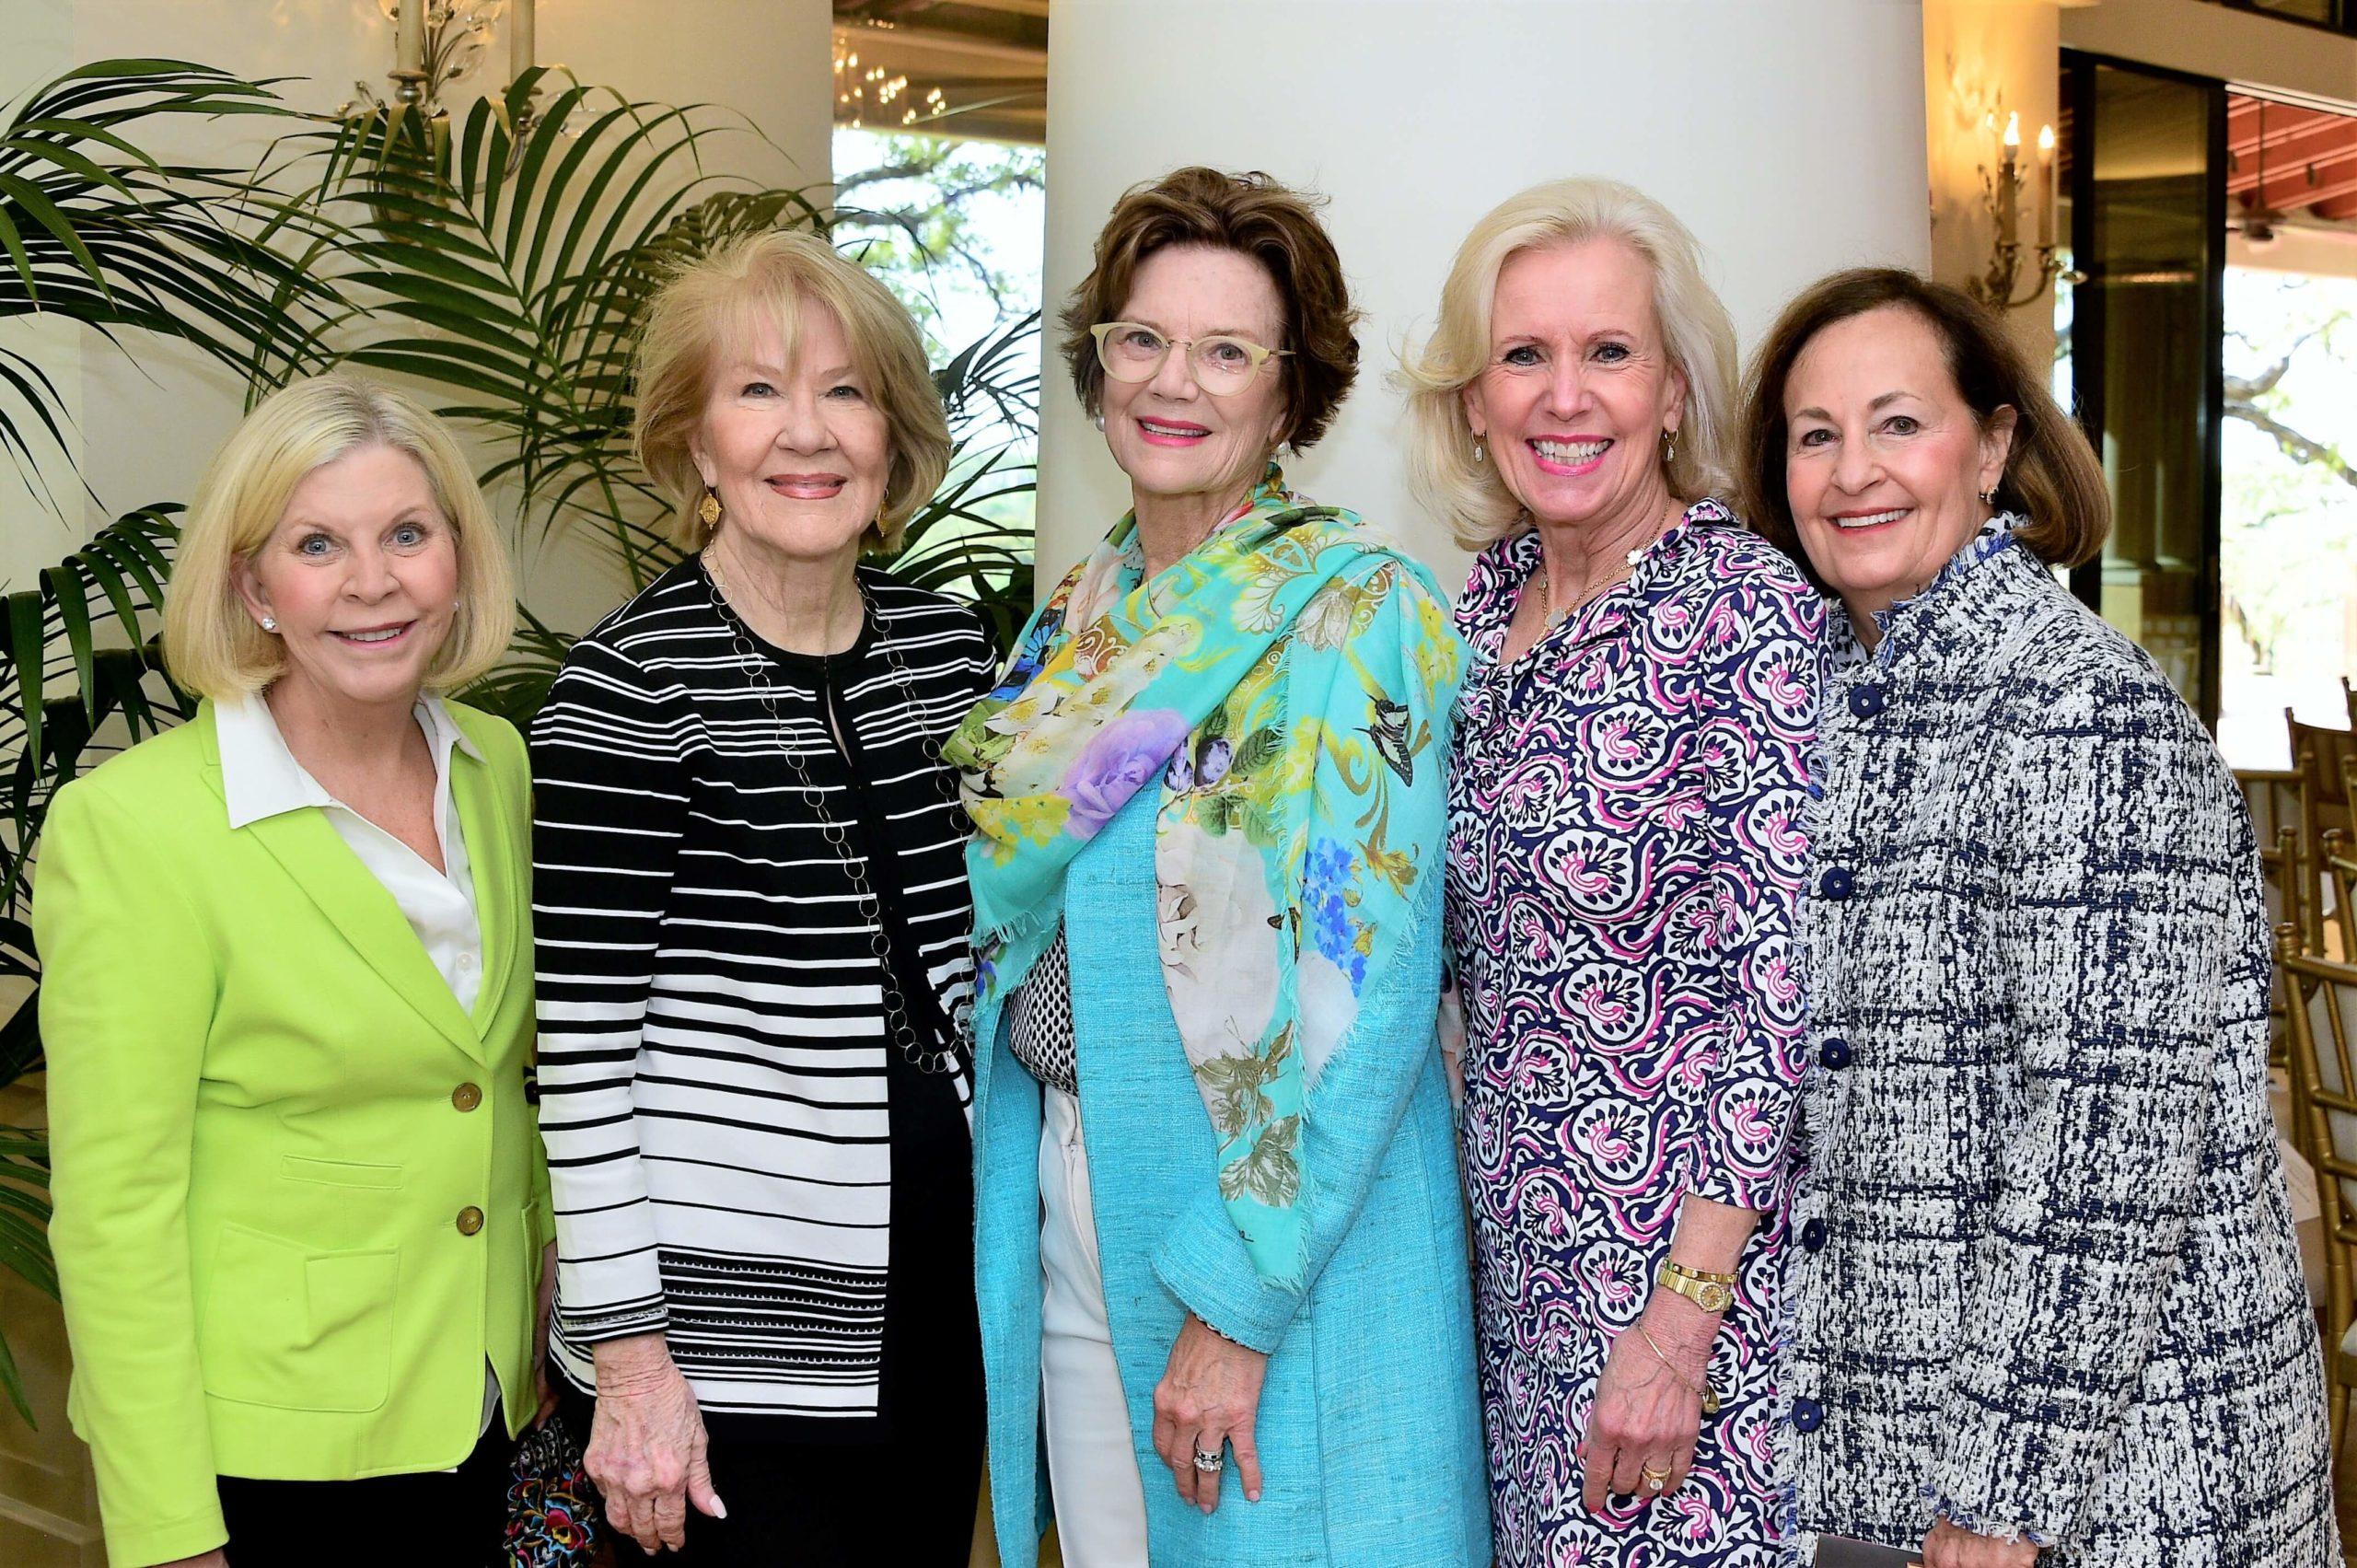 Anne Ballantyne, Diana Morehouse, Susan Smith, Betsy Gwin and Maria Morgan